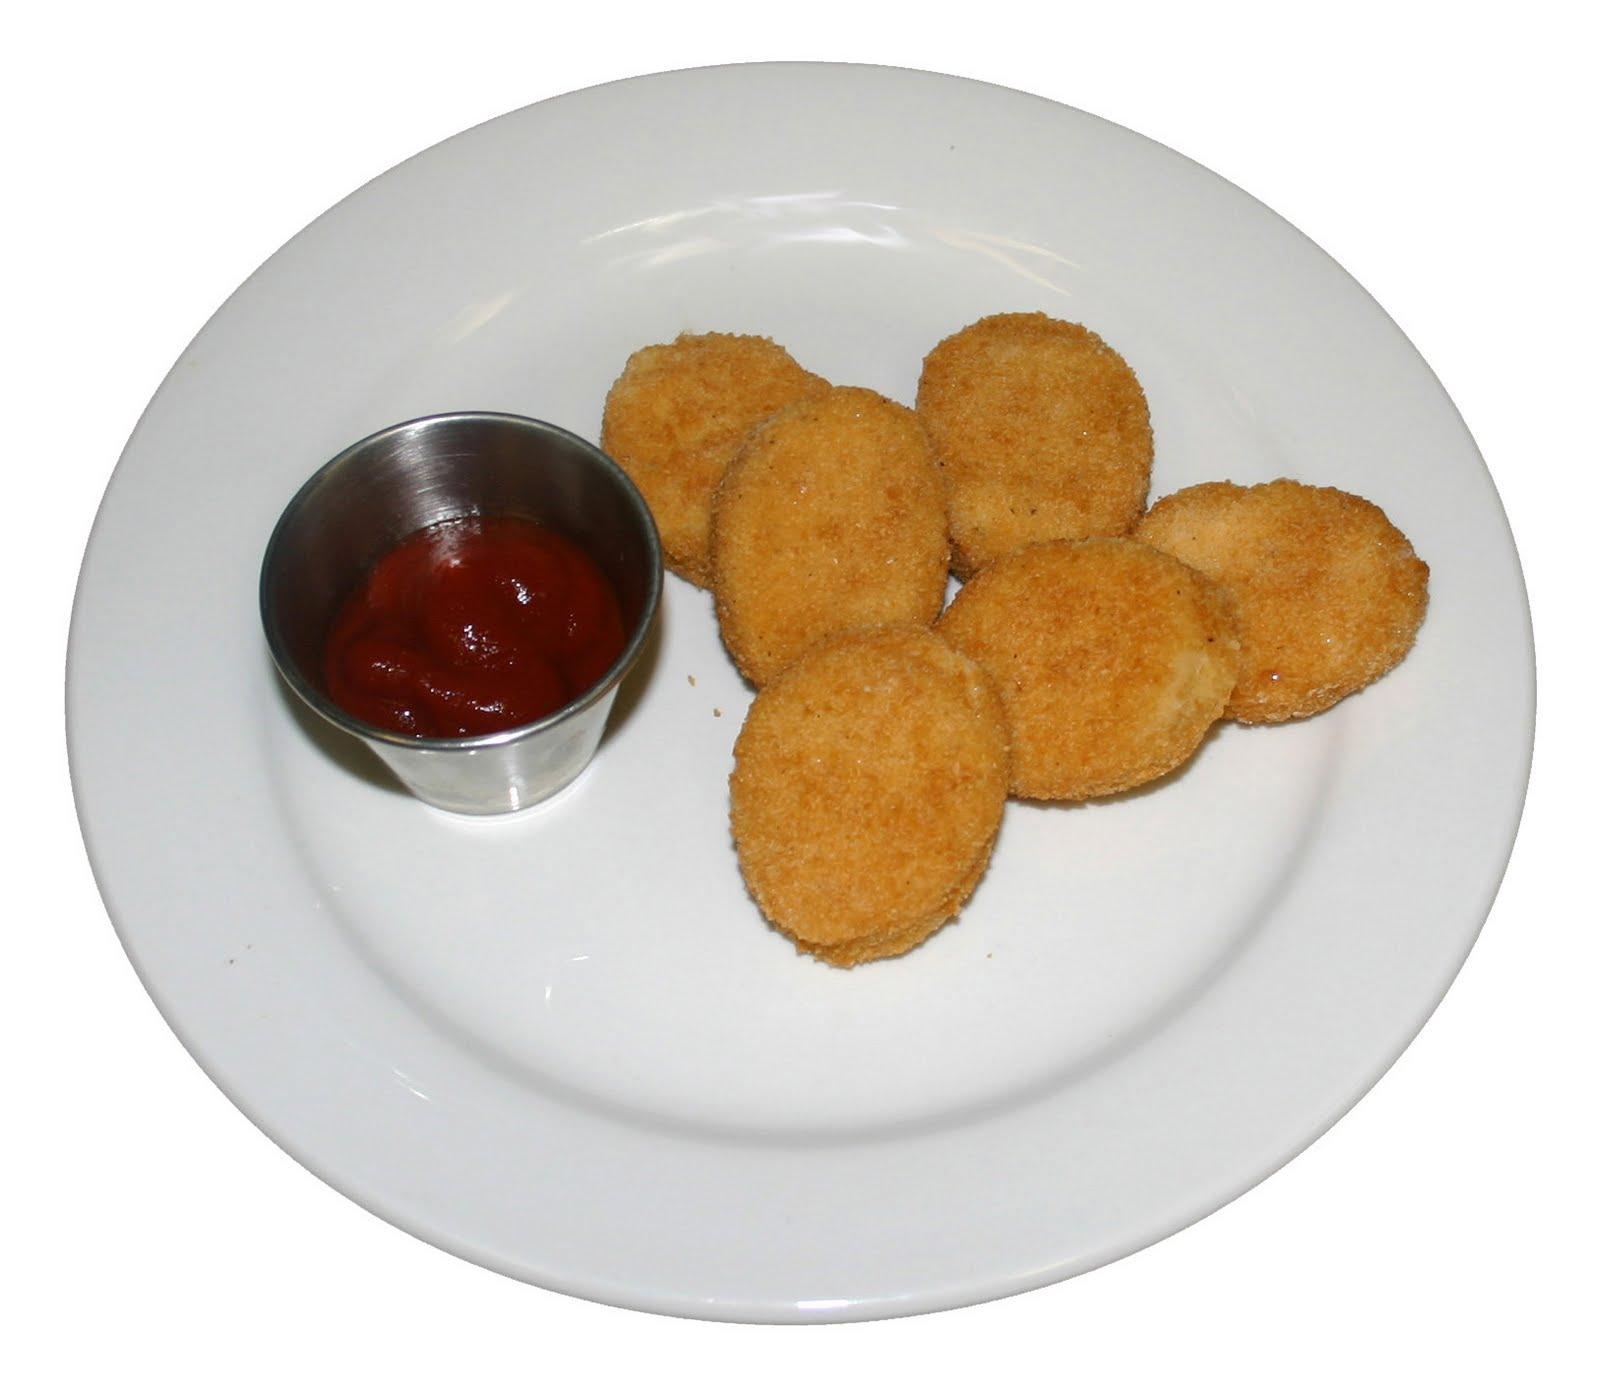 Nugget Ayam Brokoli Keju Dessy Mardiana: Haridodi: Resep Nugget Ayam Keju